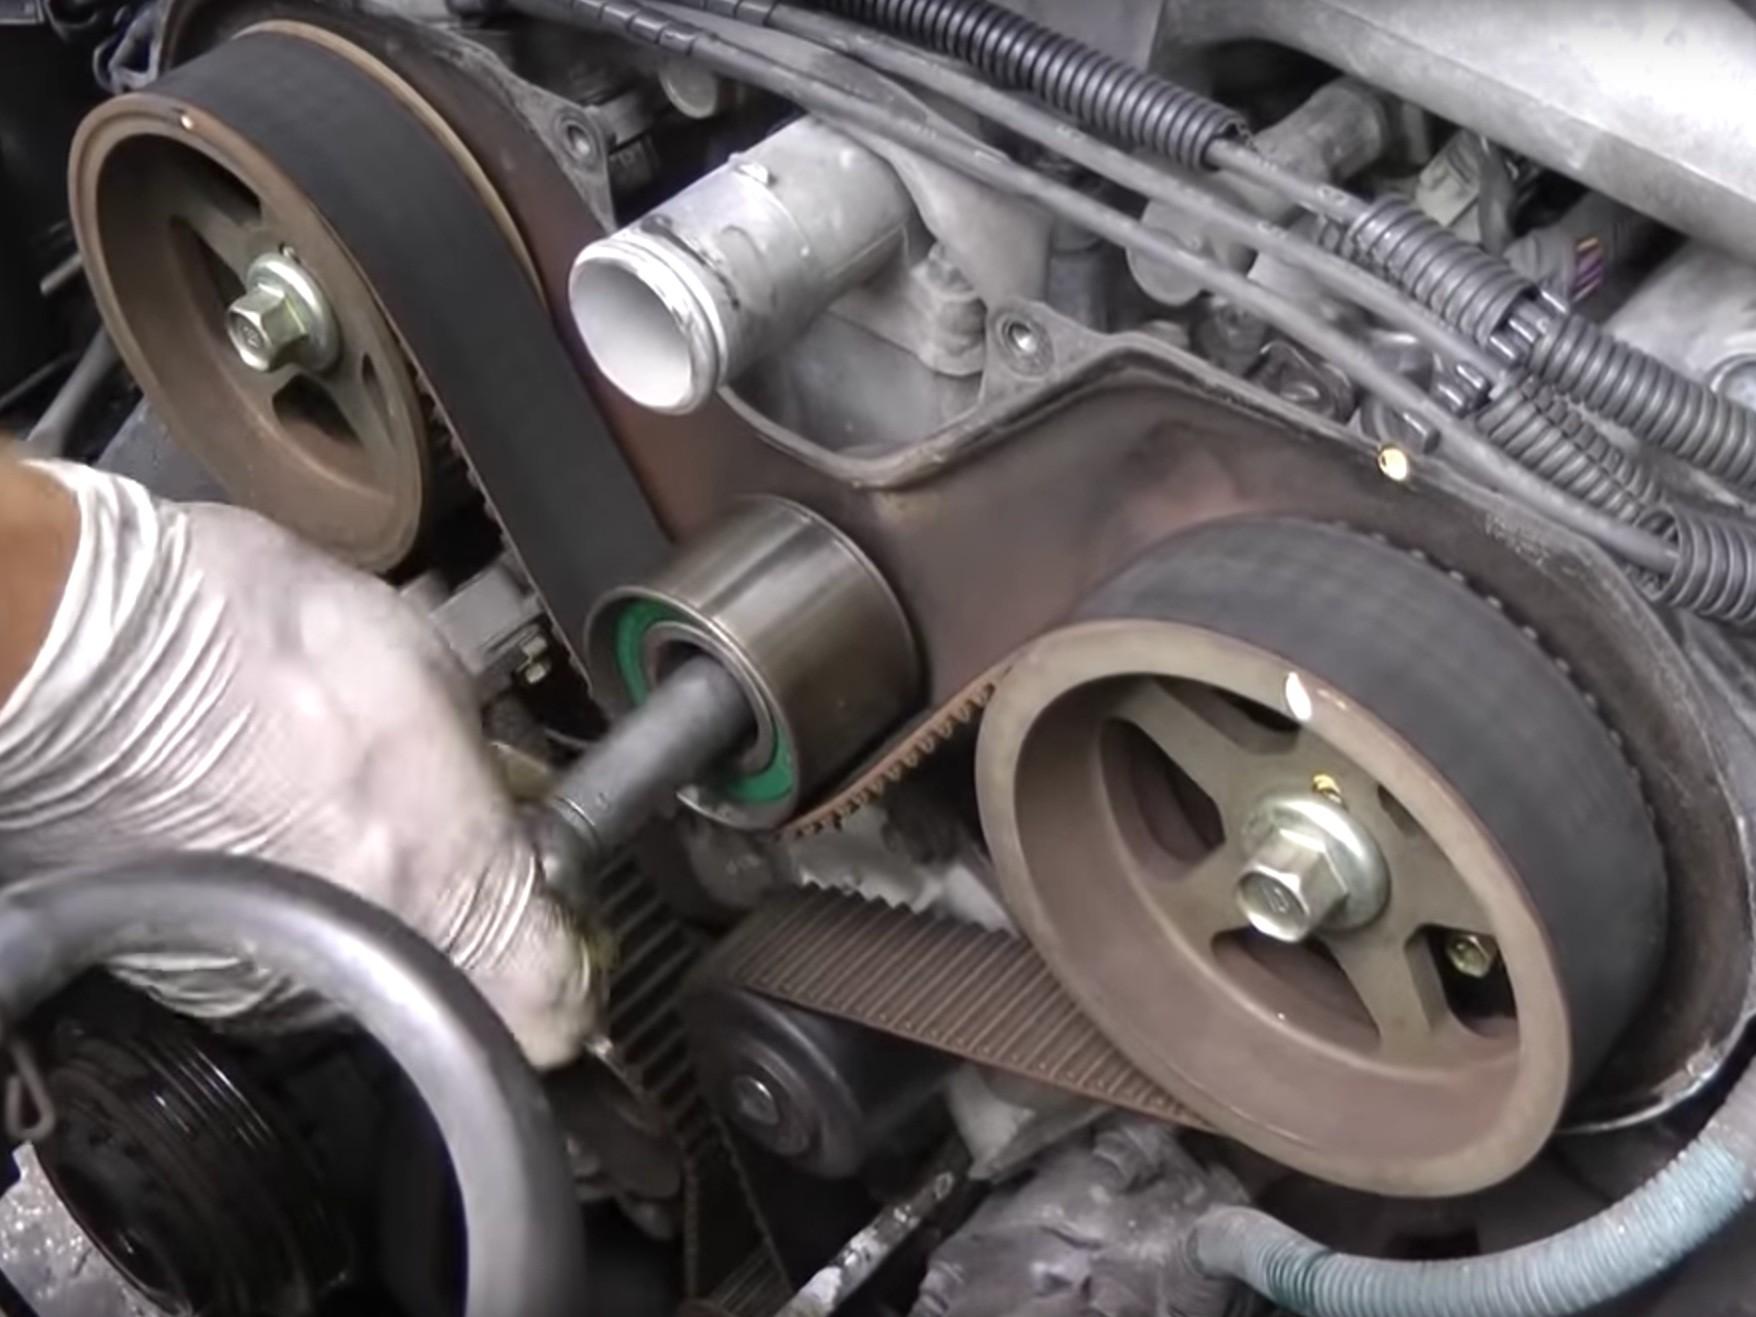 1996 toyota Tercel Engine Diagram 1995 2002 toyota 4runner 3 4l Timing Belt Water Pump Replacement Of 1996 toyota Tercel Engine Diagram